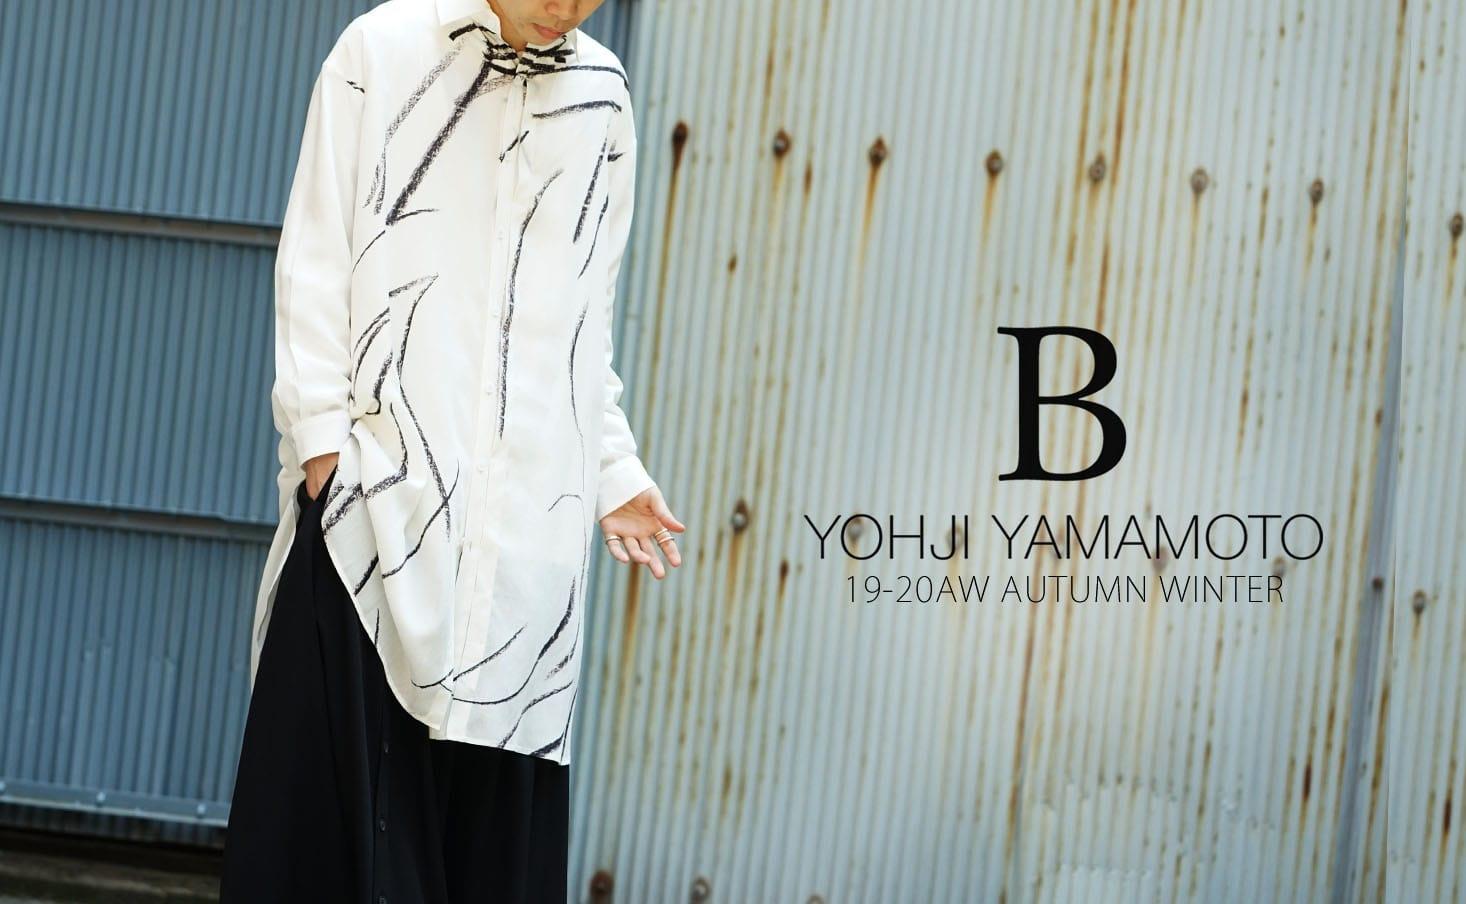 B Yohji Yamamoto 2019-20AW Collection